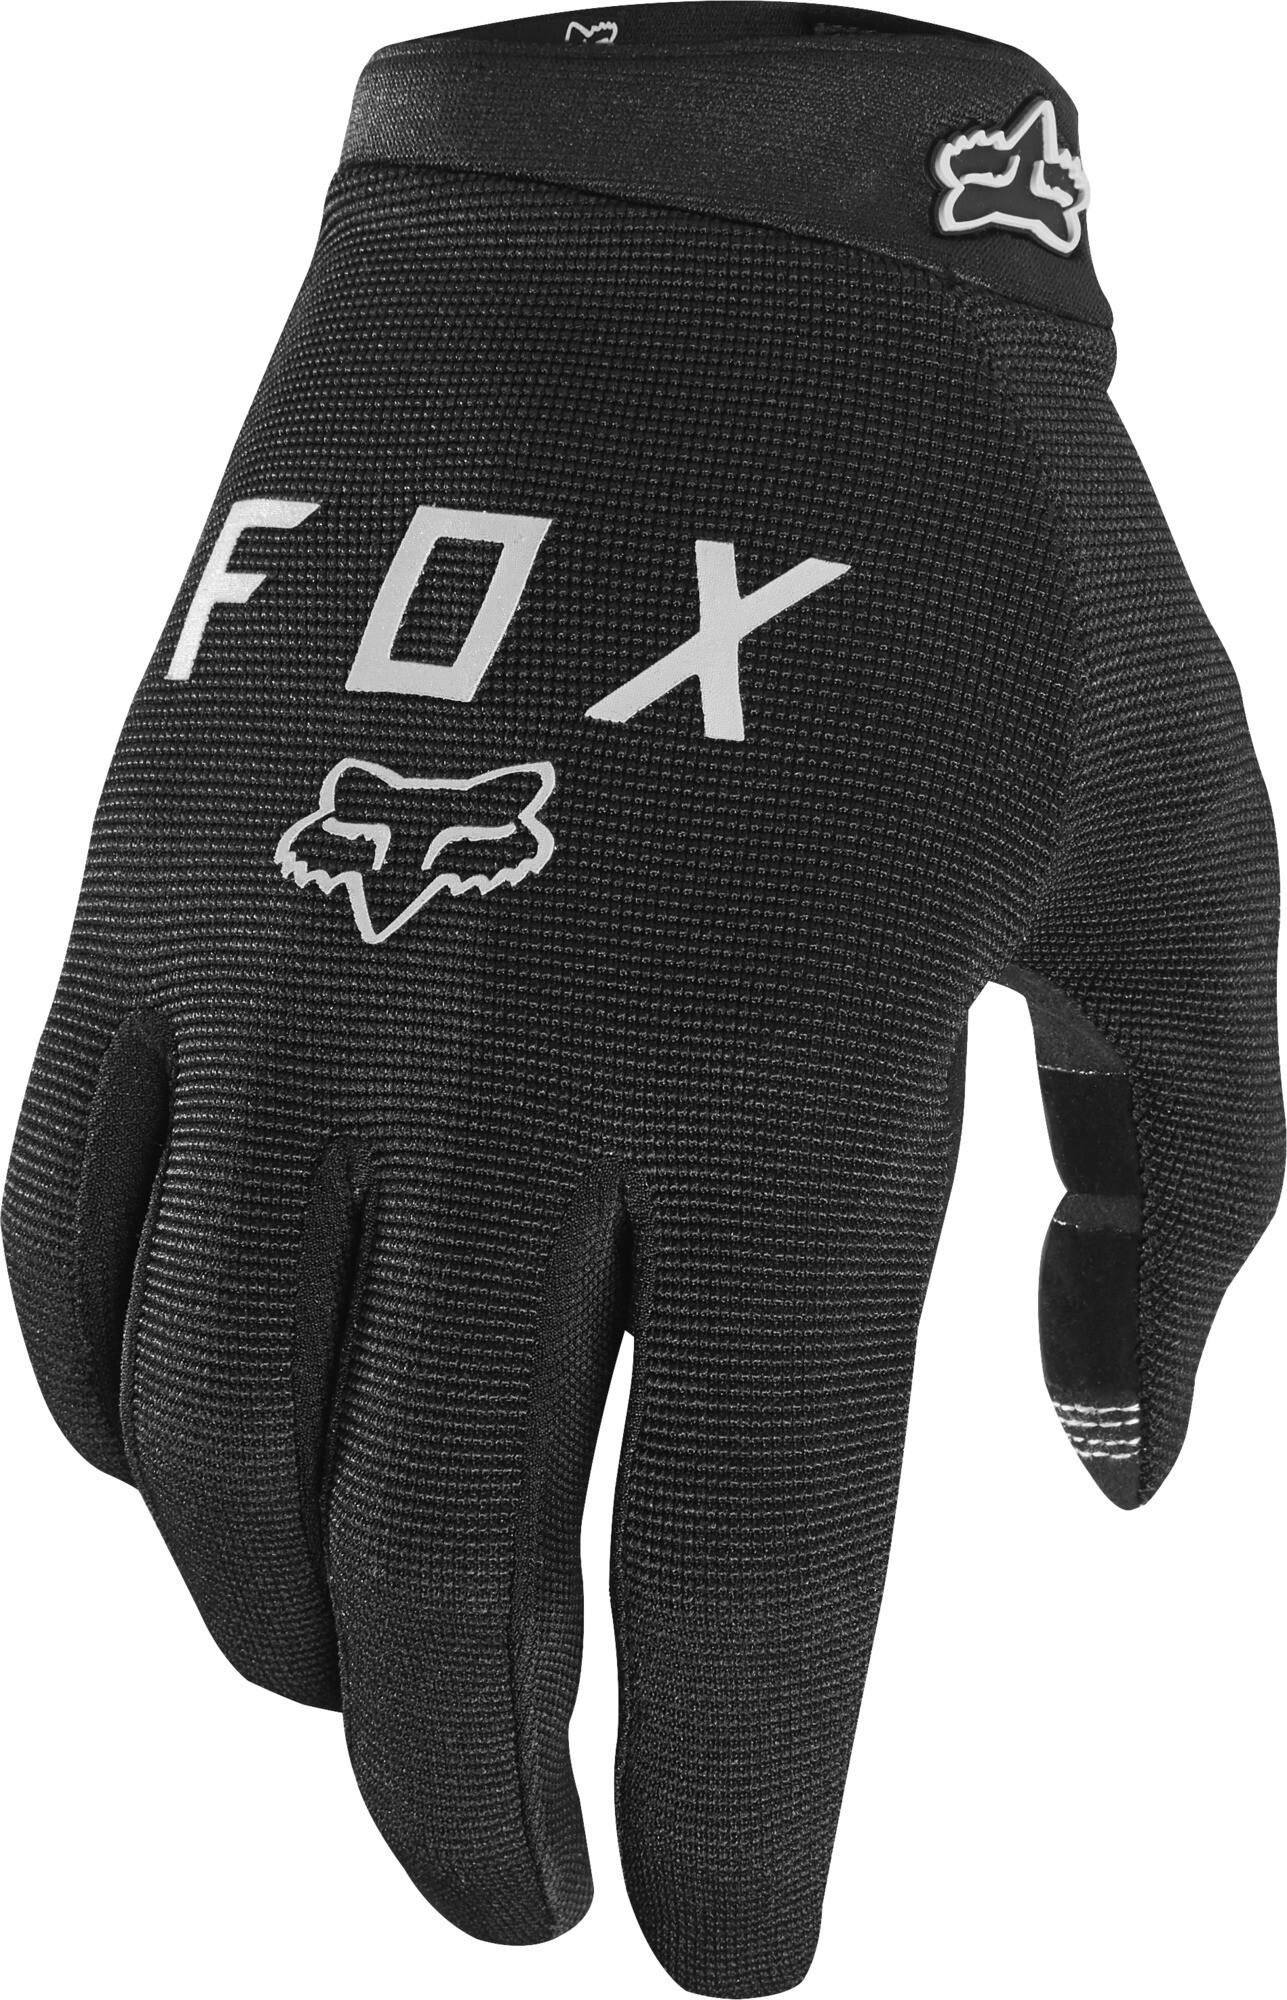 Fox Gloves Ranger Gel Short Black L